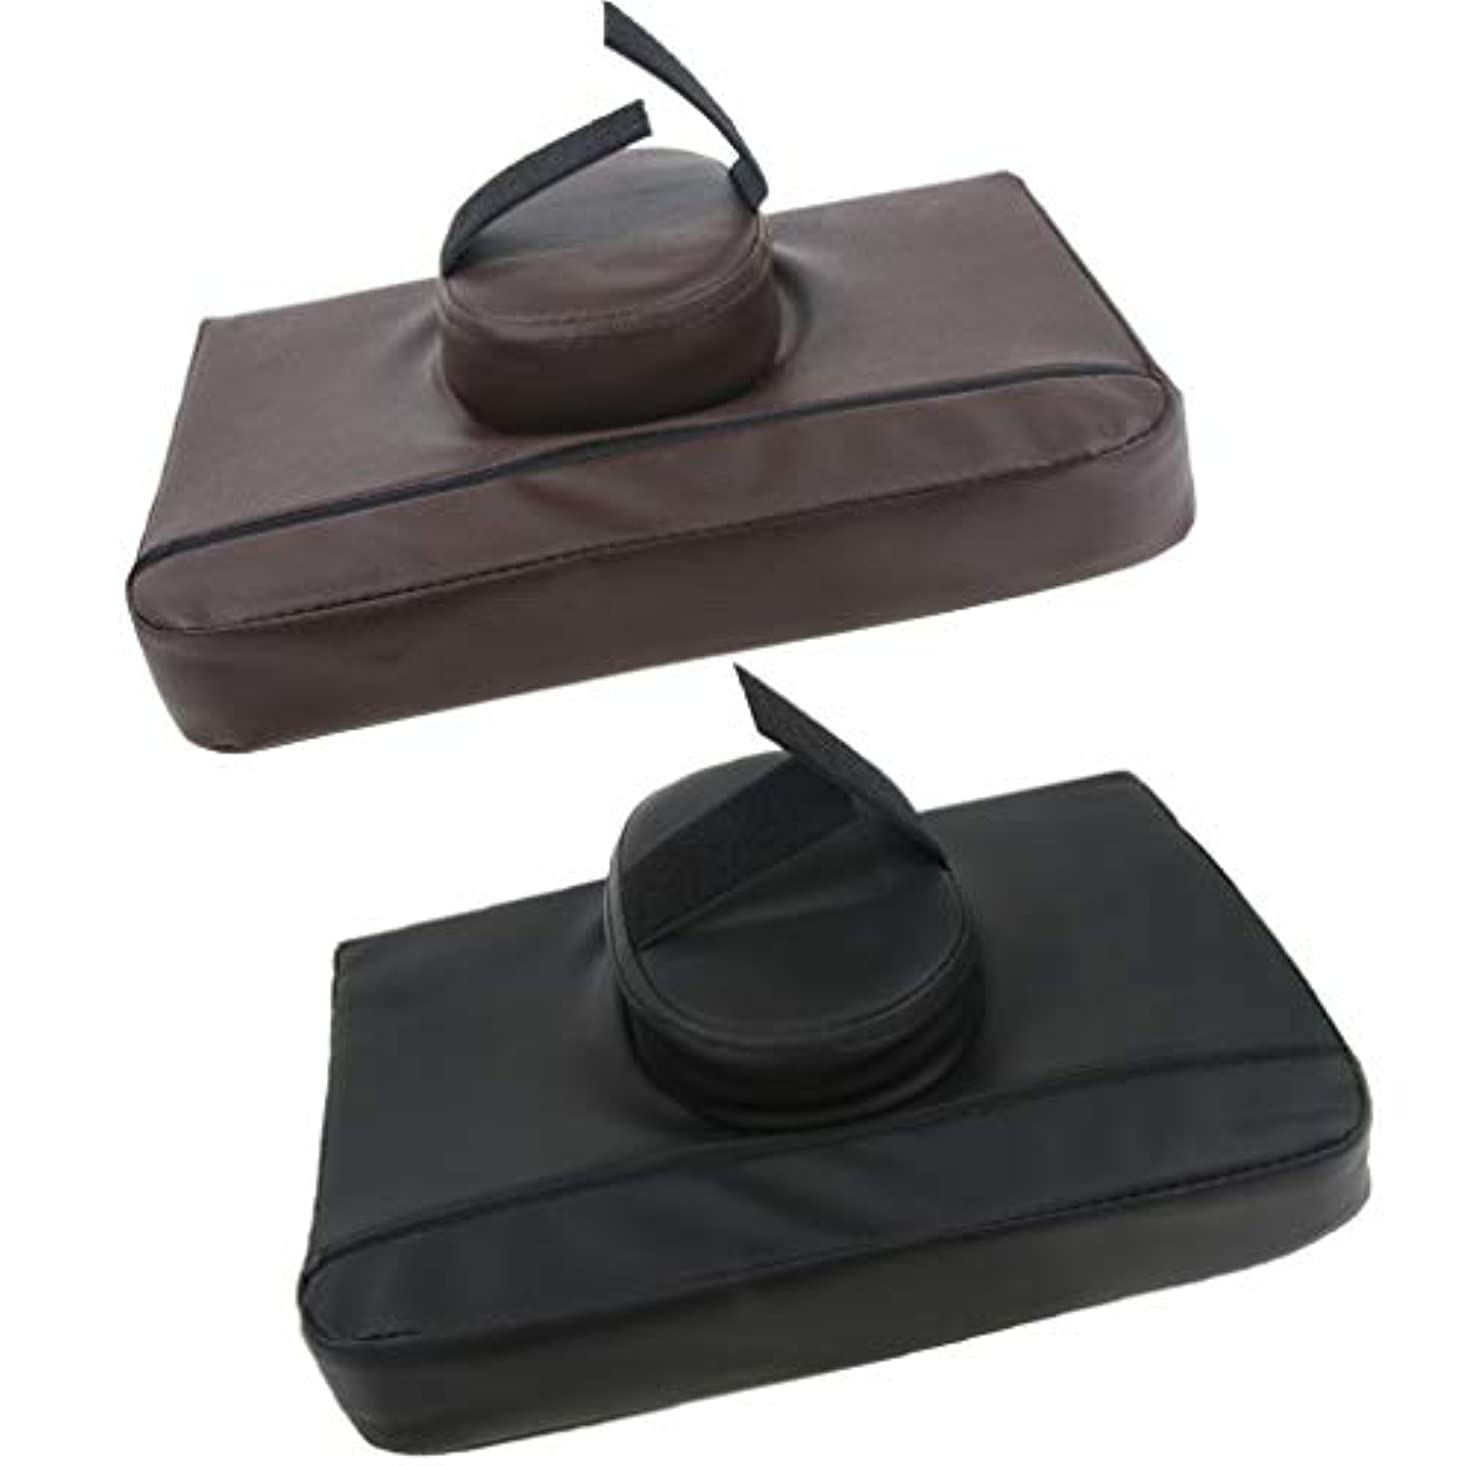 KESOTO 2個 マッサージ枕 マッサージピロー スクエア マッサージテーブル用 通気性 快適 プレゼント